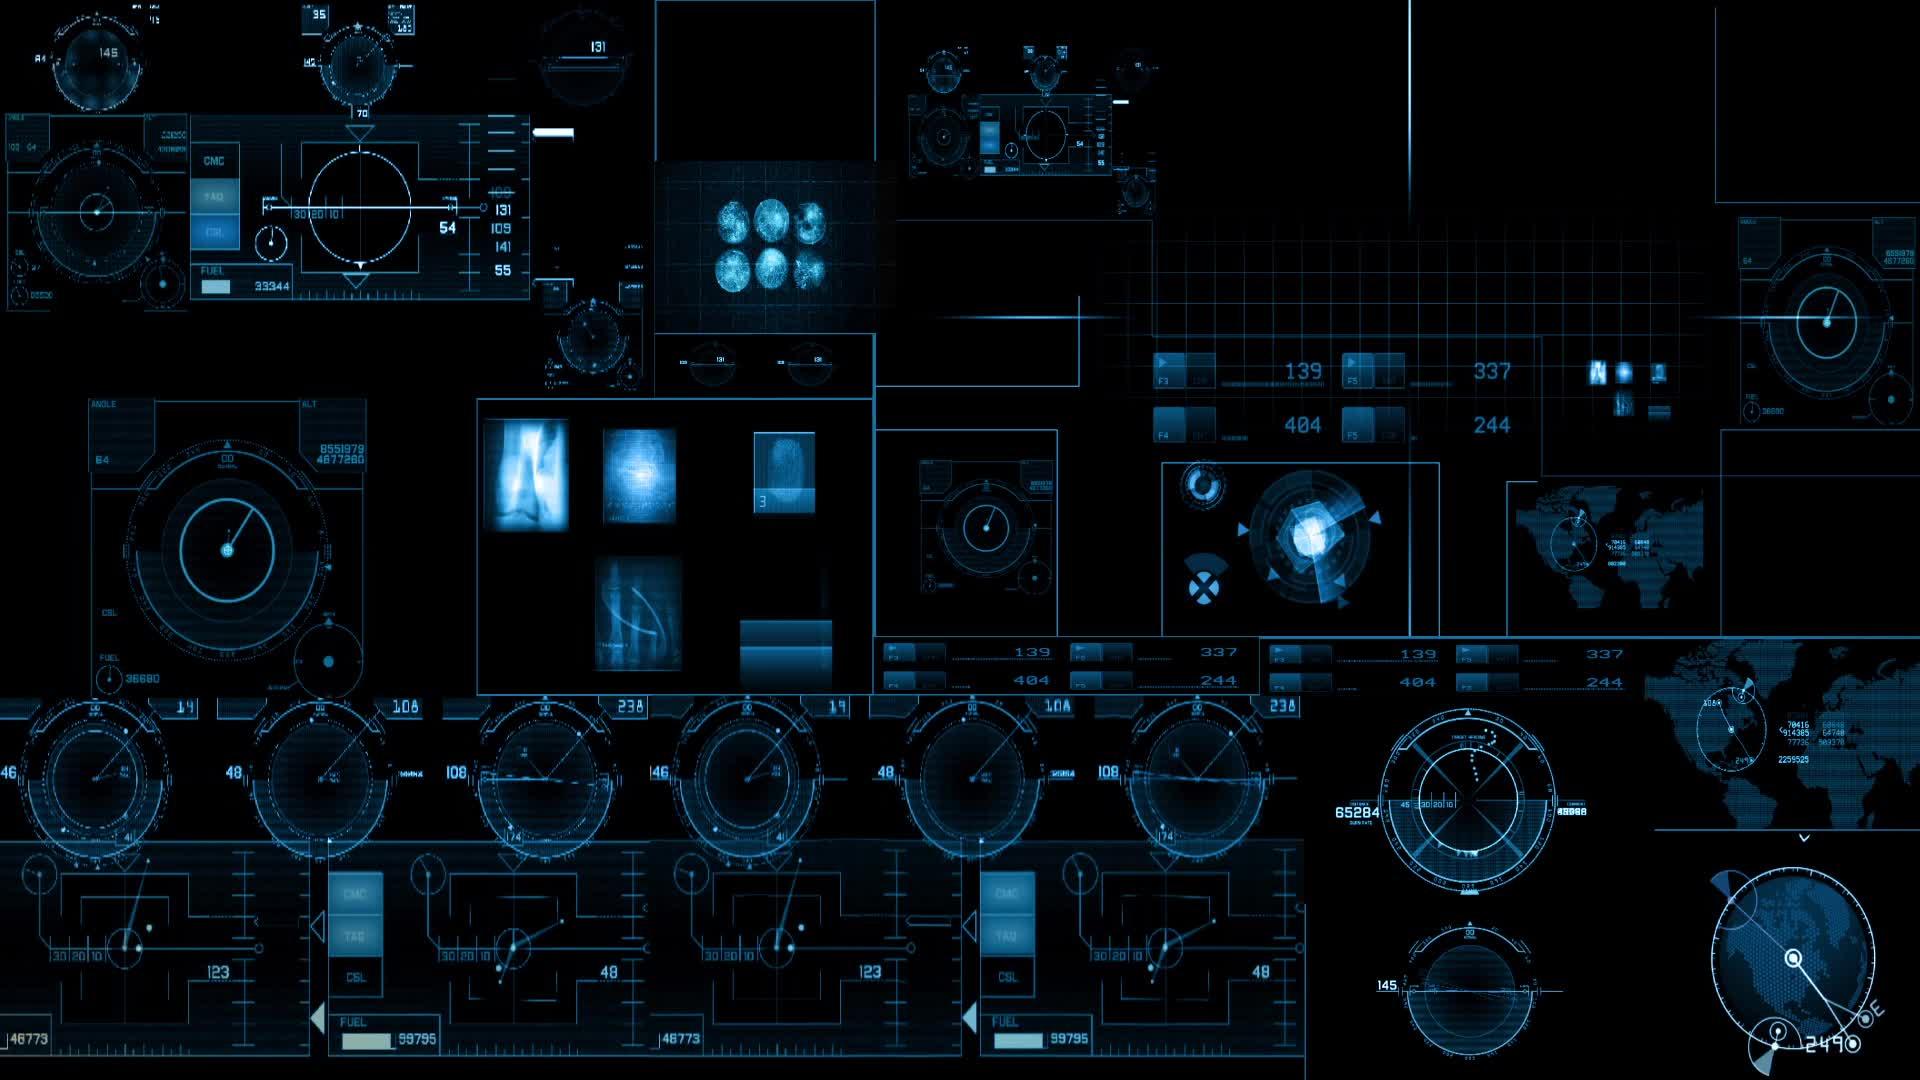 futuristic machine graphic overlay - HD1920×1080